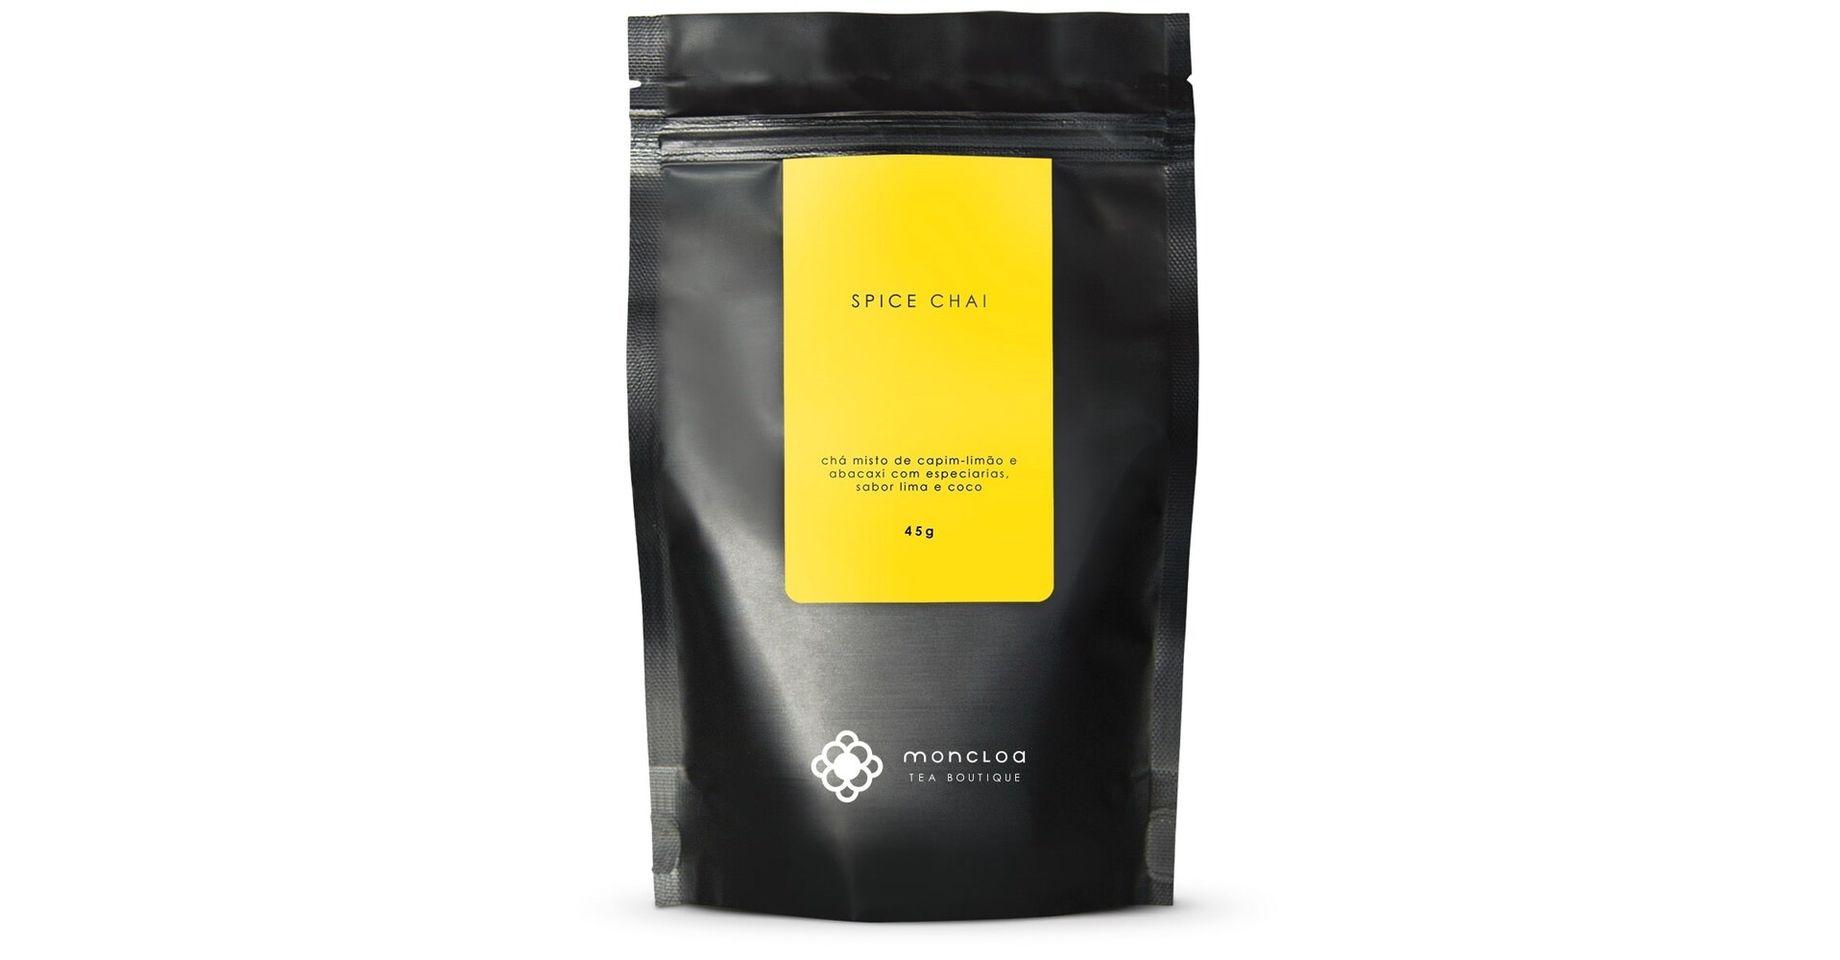 804133-Spice-Chai-Pouch